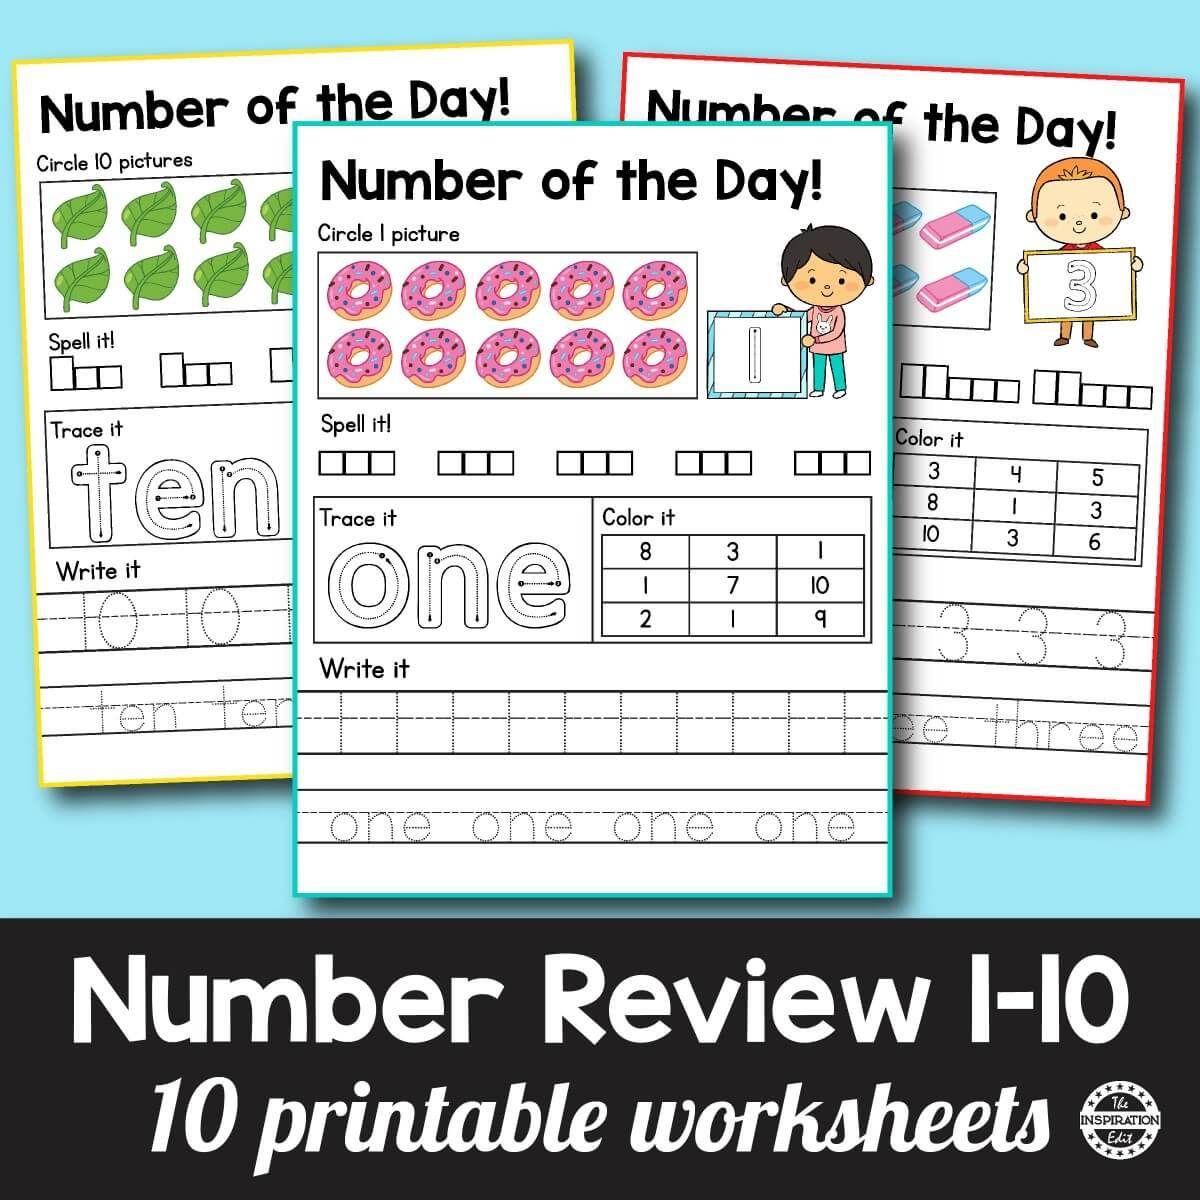 Fantastic Number Of The Day Preschool Worksheetsfantastic